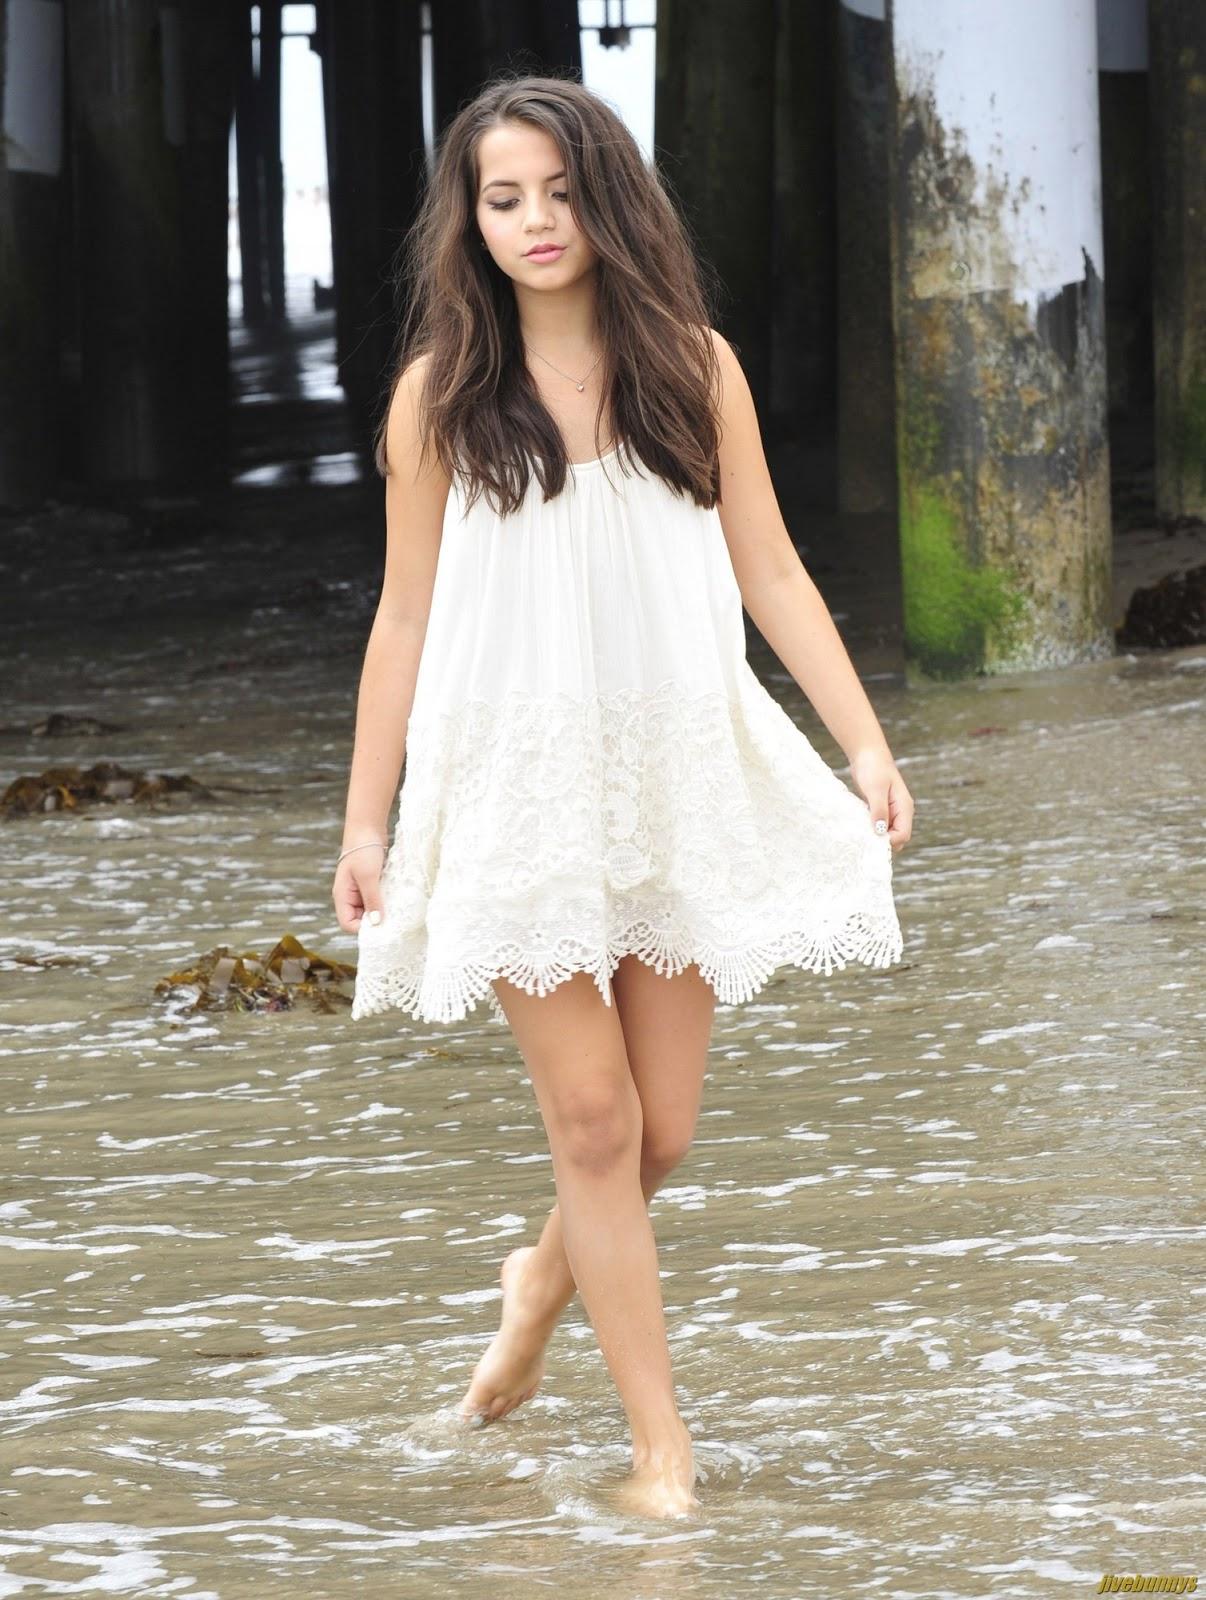 Isabela Moner Teen Singer Photo Gallery 2 Abbie Cornish Instagram